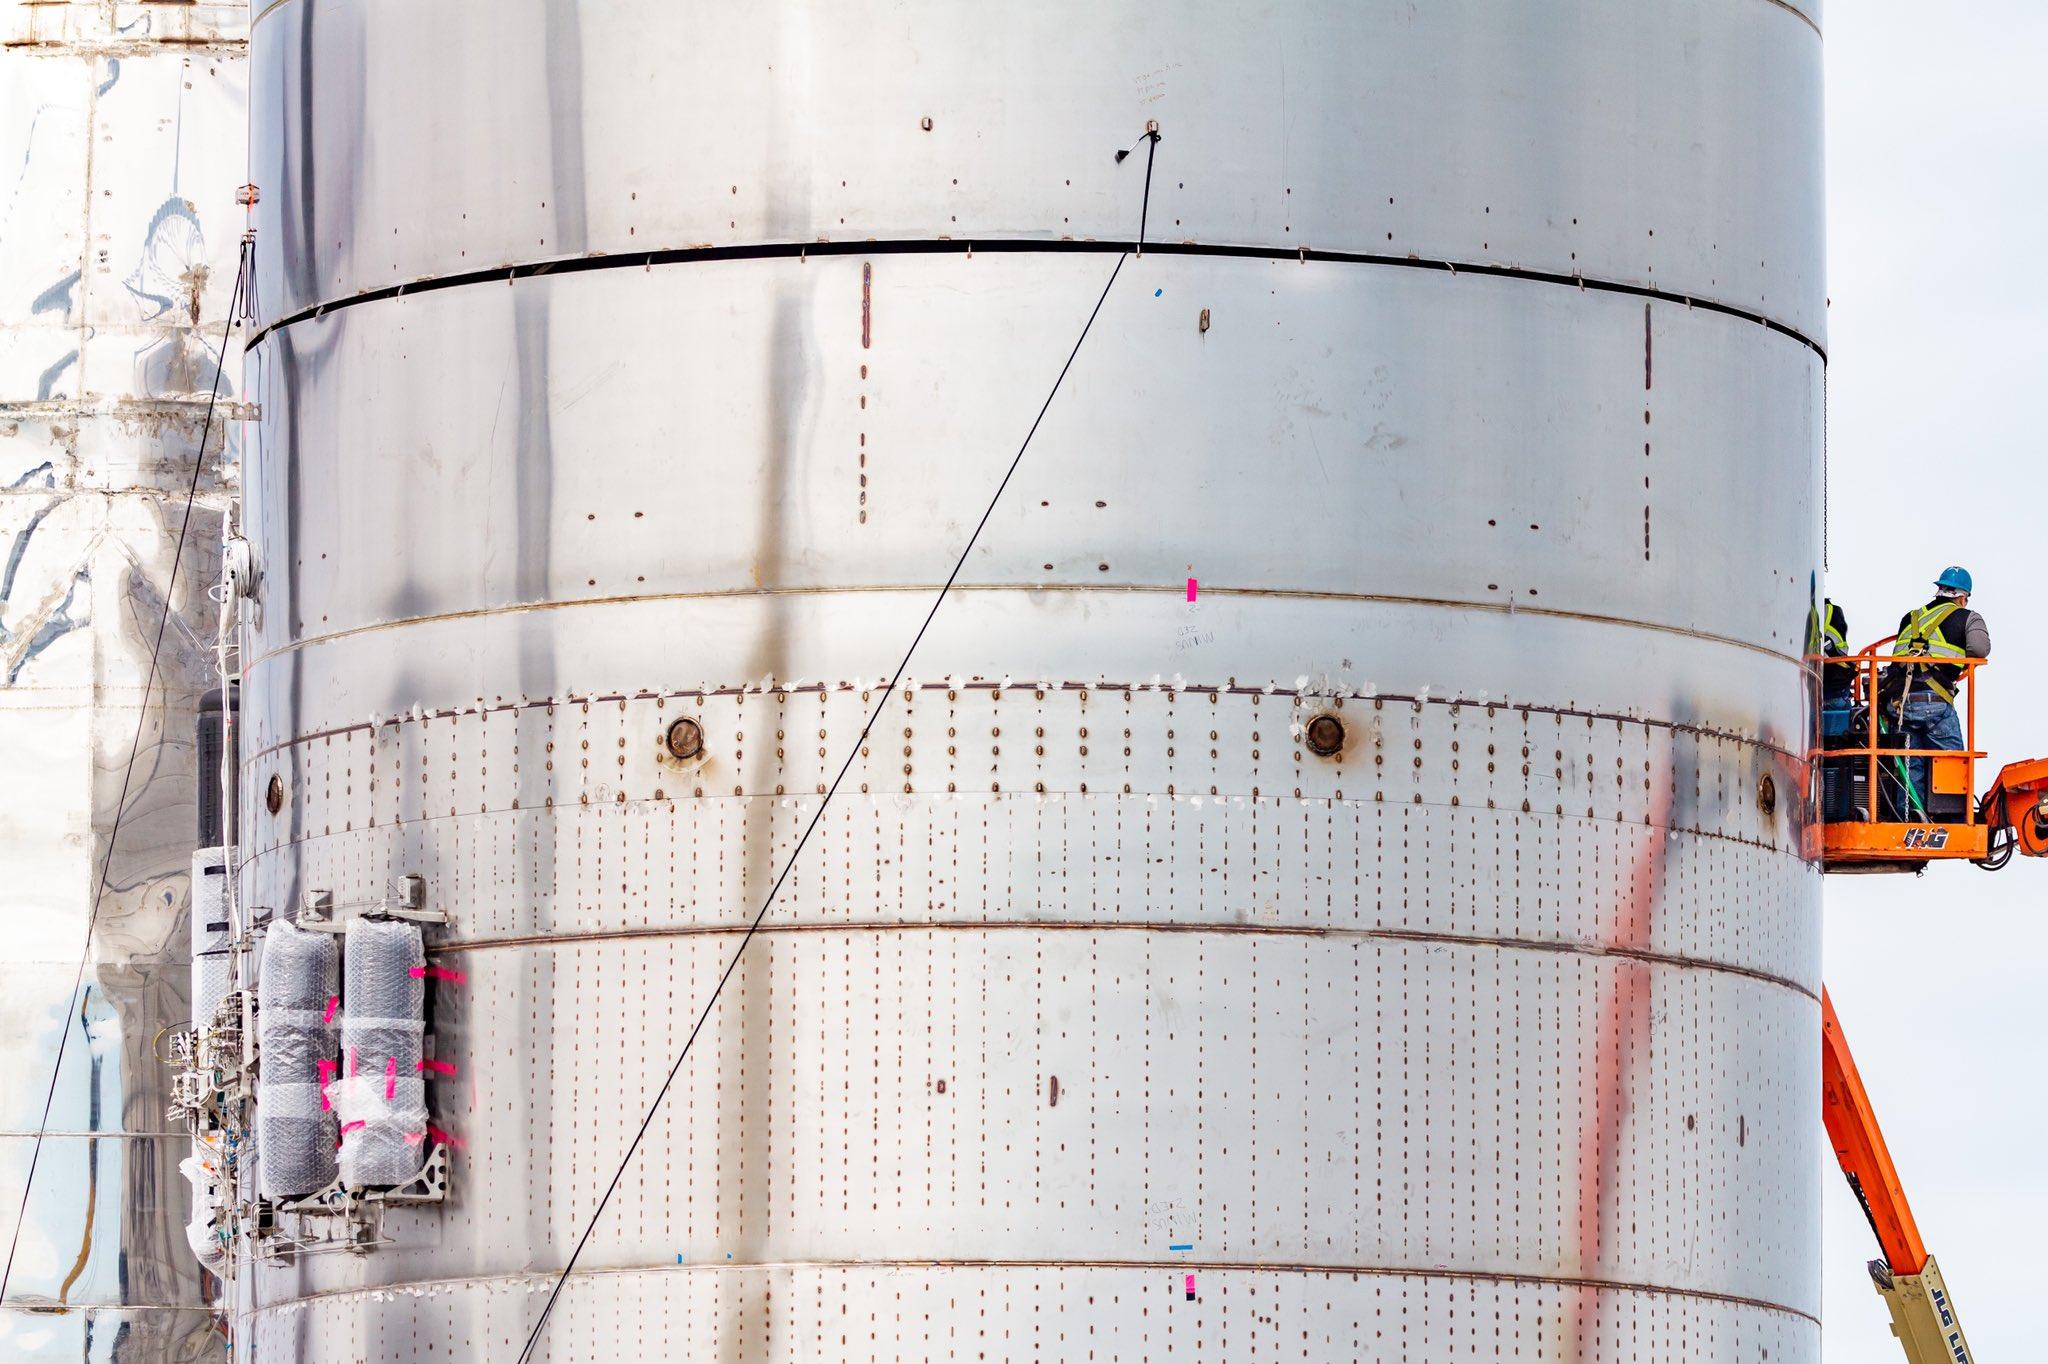 Starship SN1 (ex Mk3) (Boca Chica) - Page 11 ERZ7f-VXUAEtvC9?format=jpg&name=4096x4096